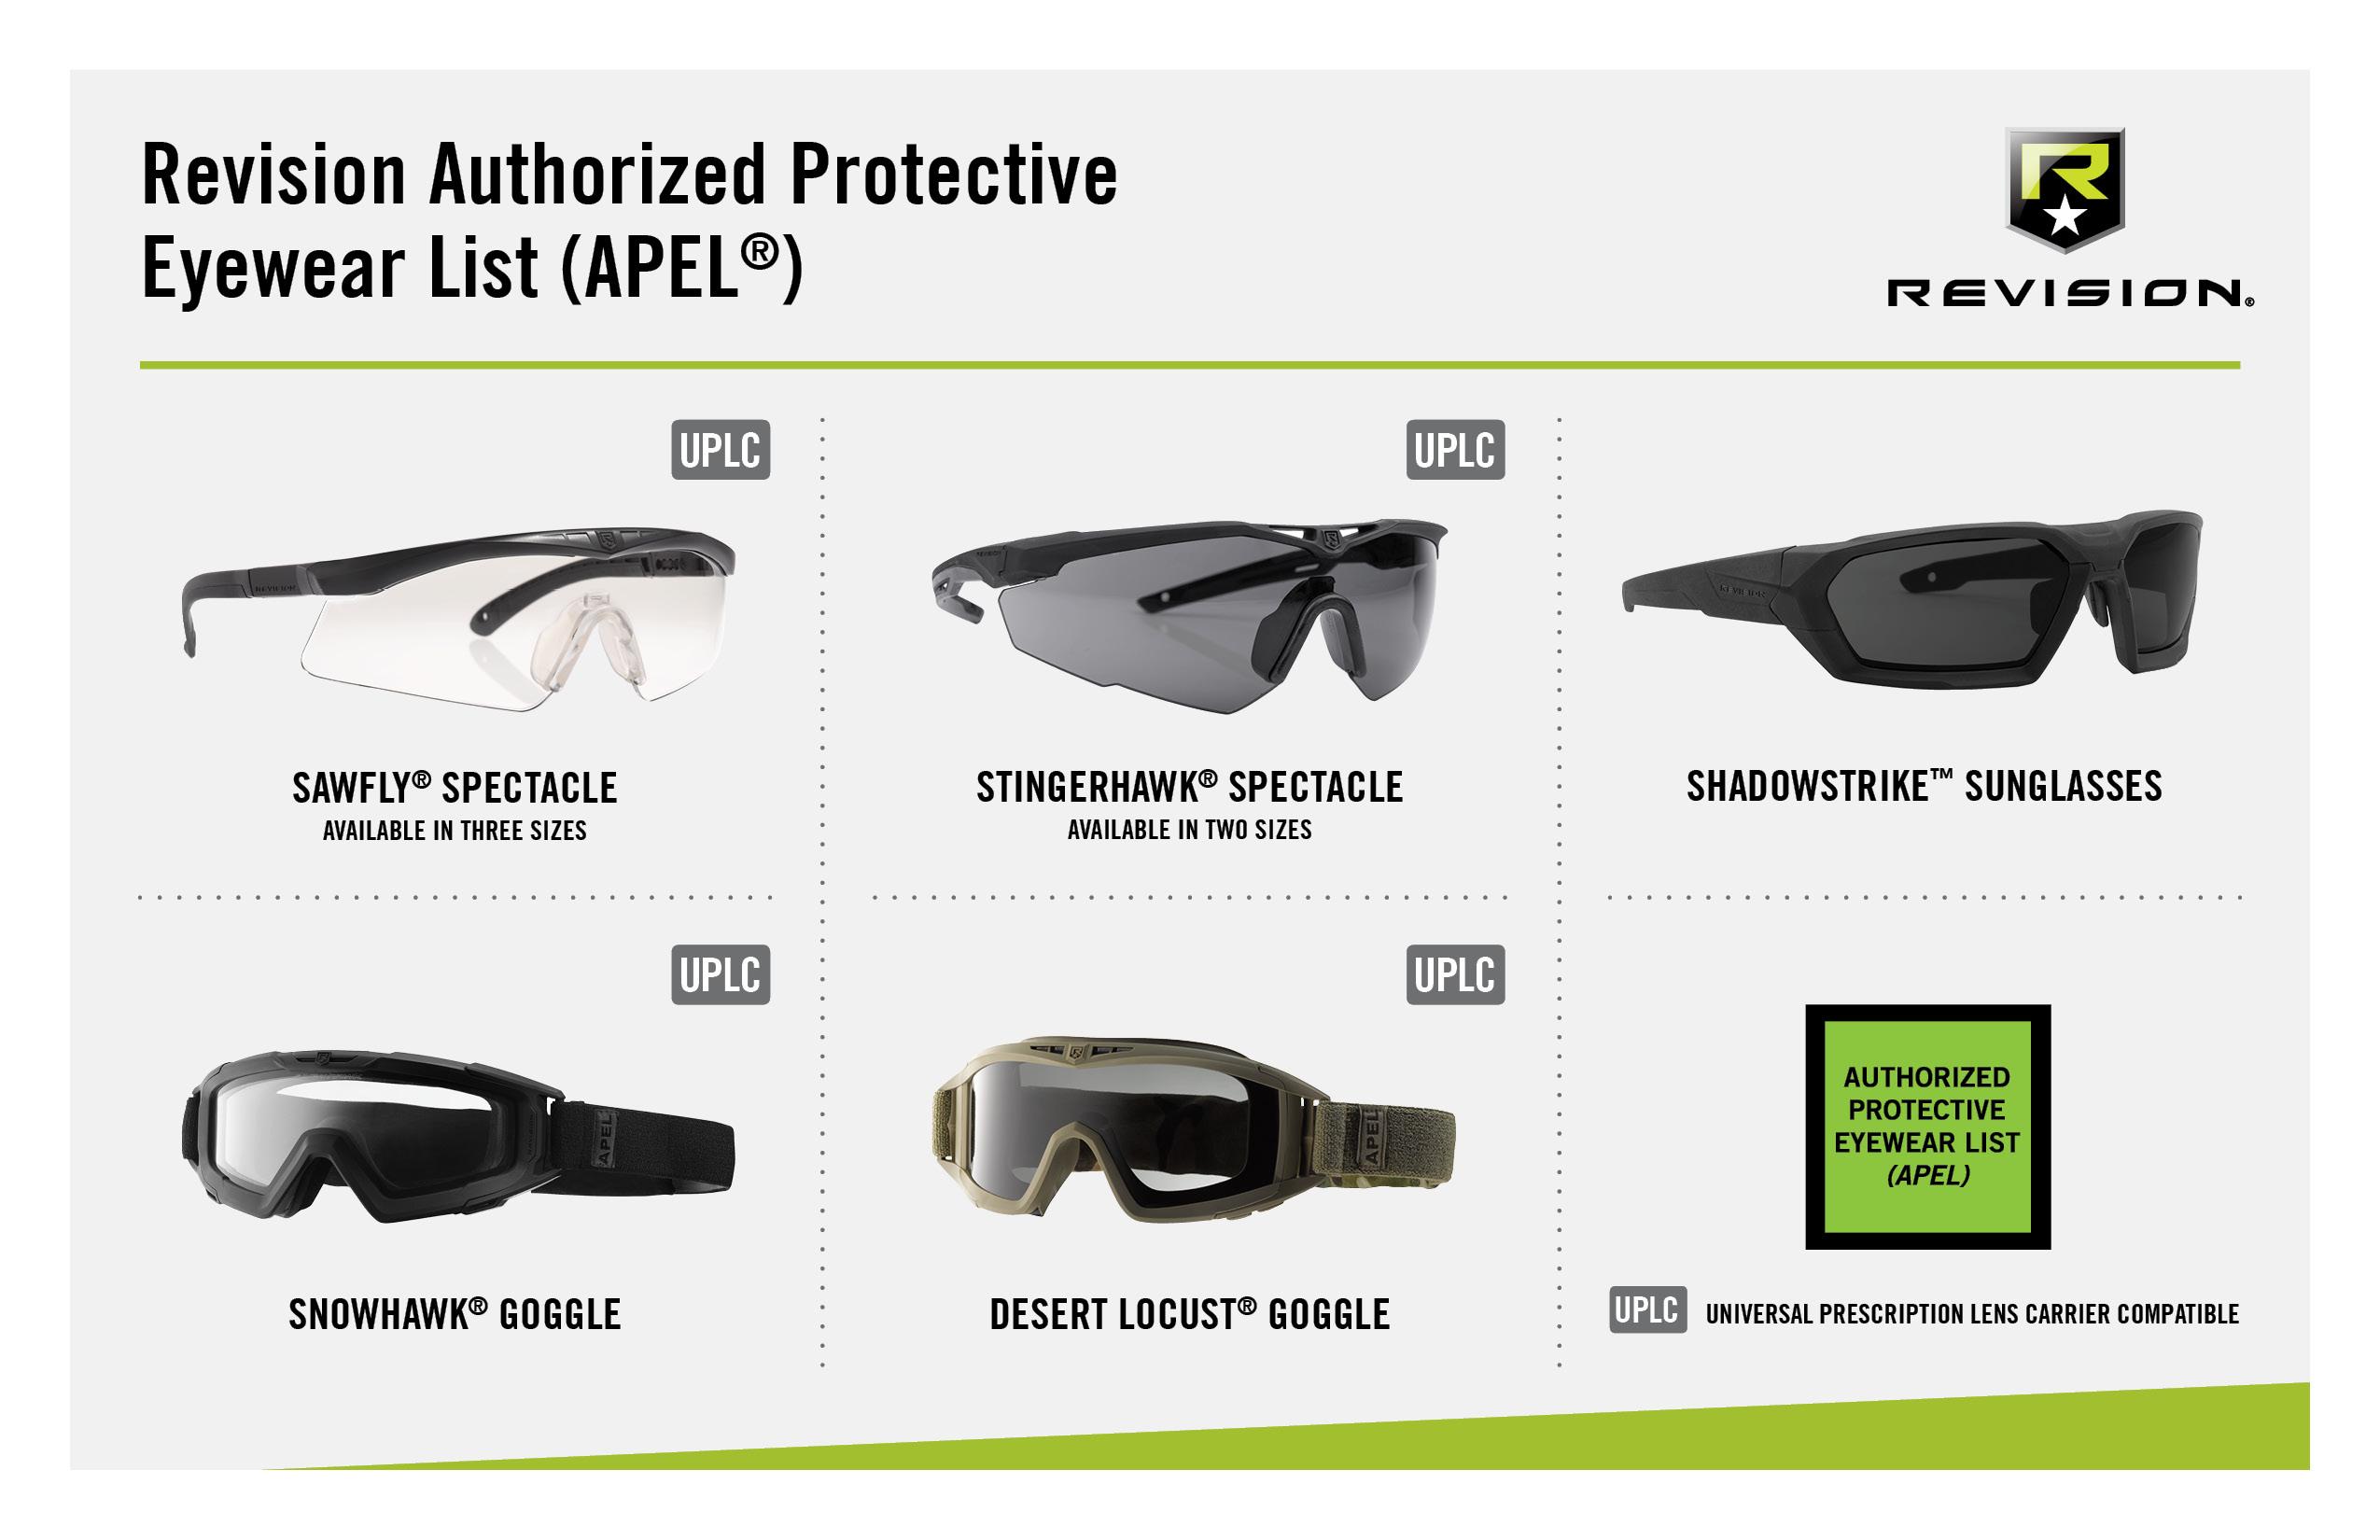 Revision's APEL eyewear